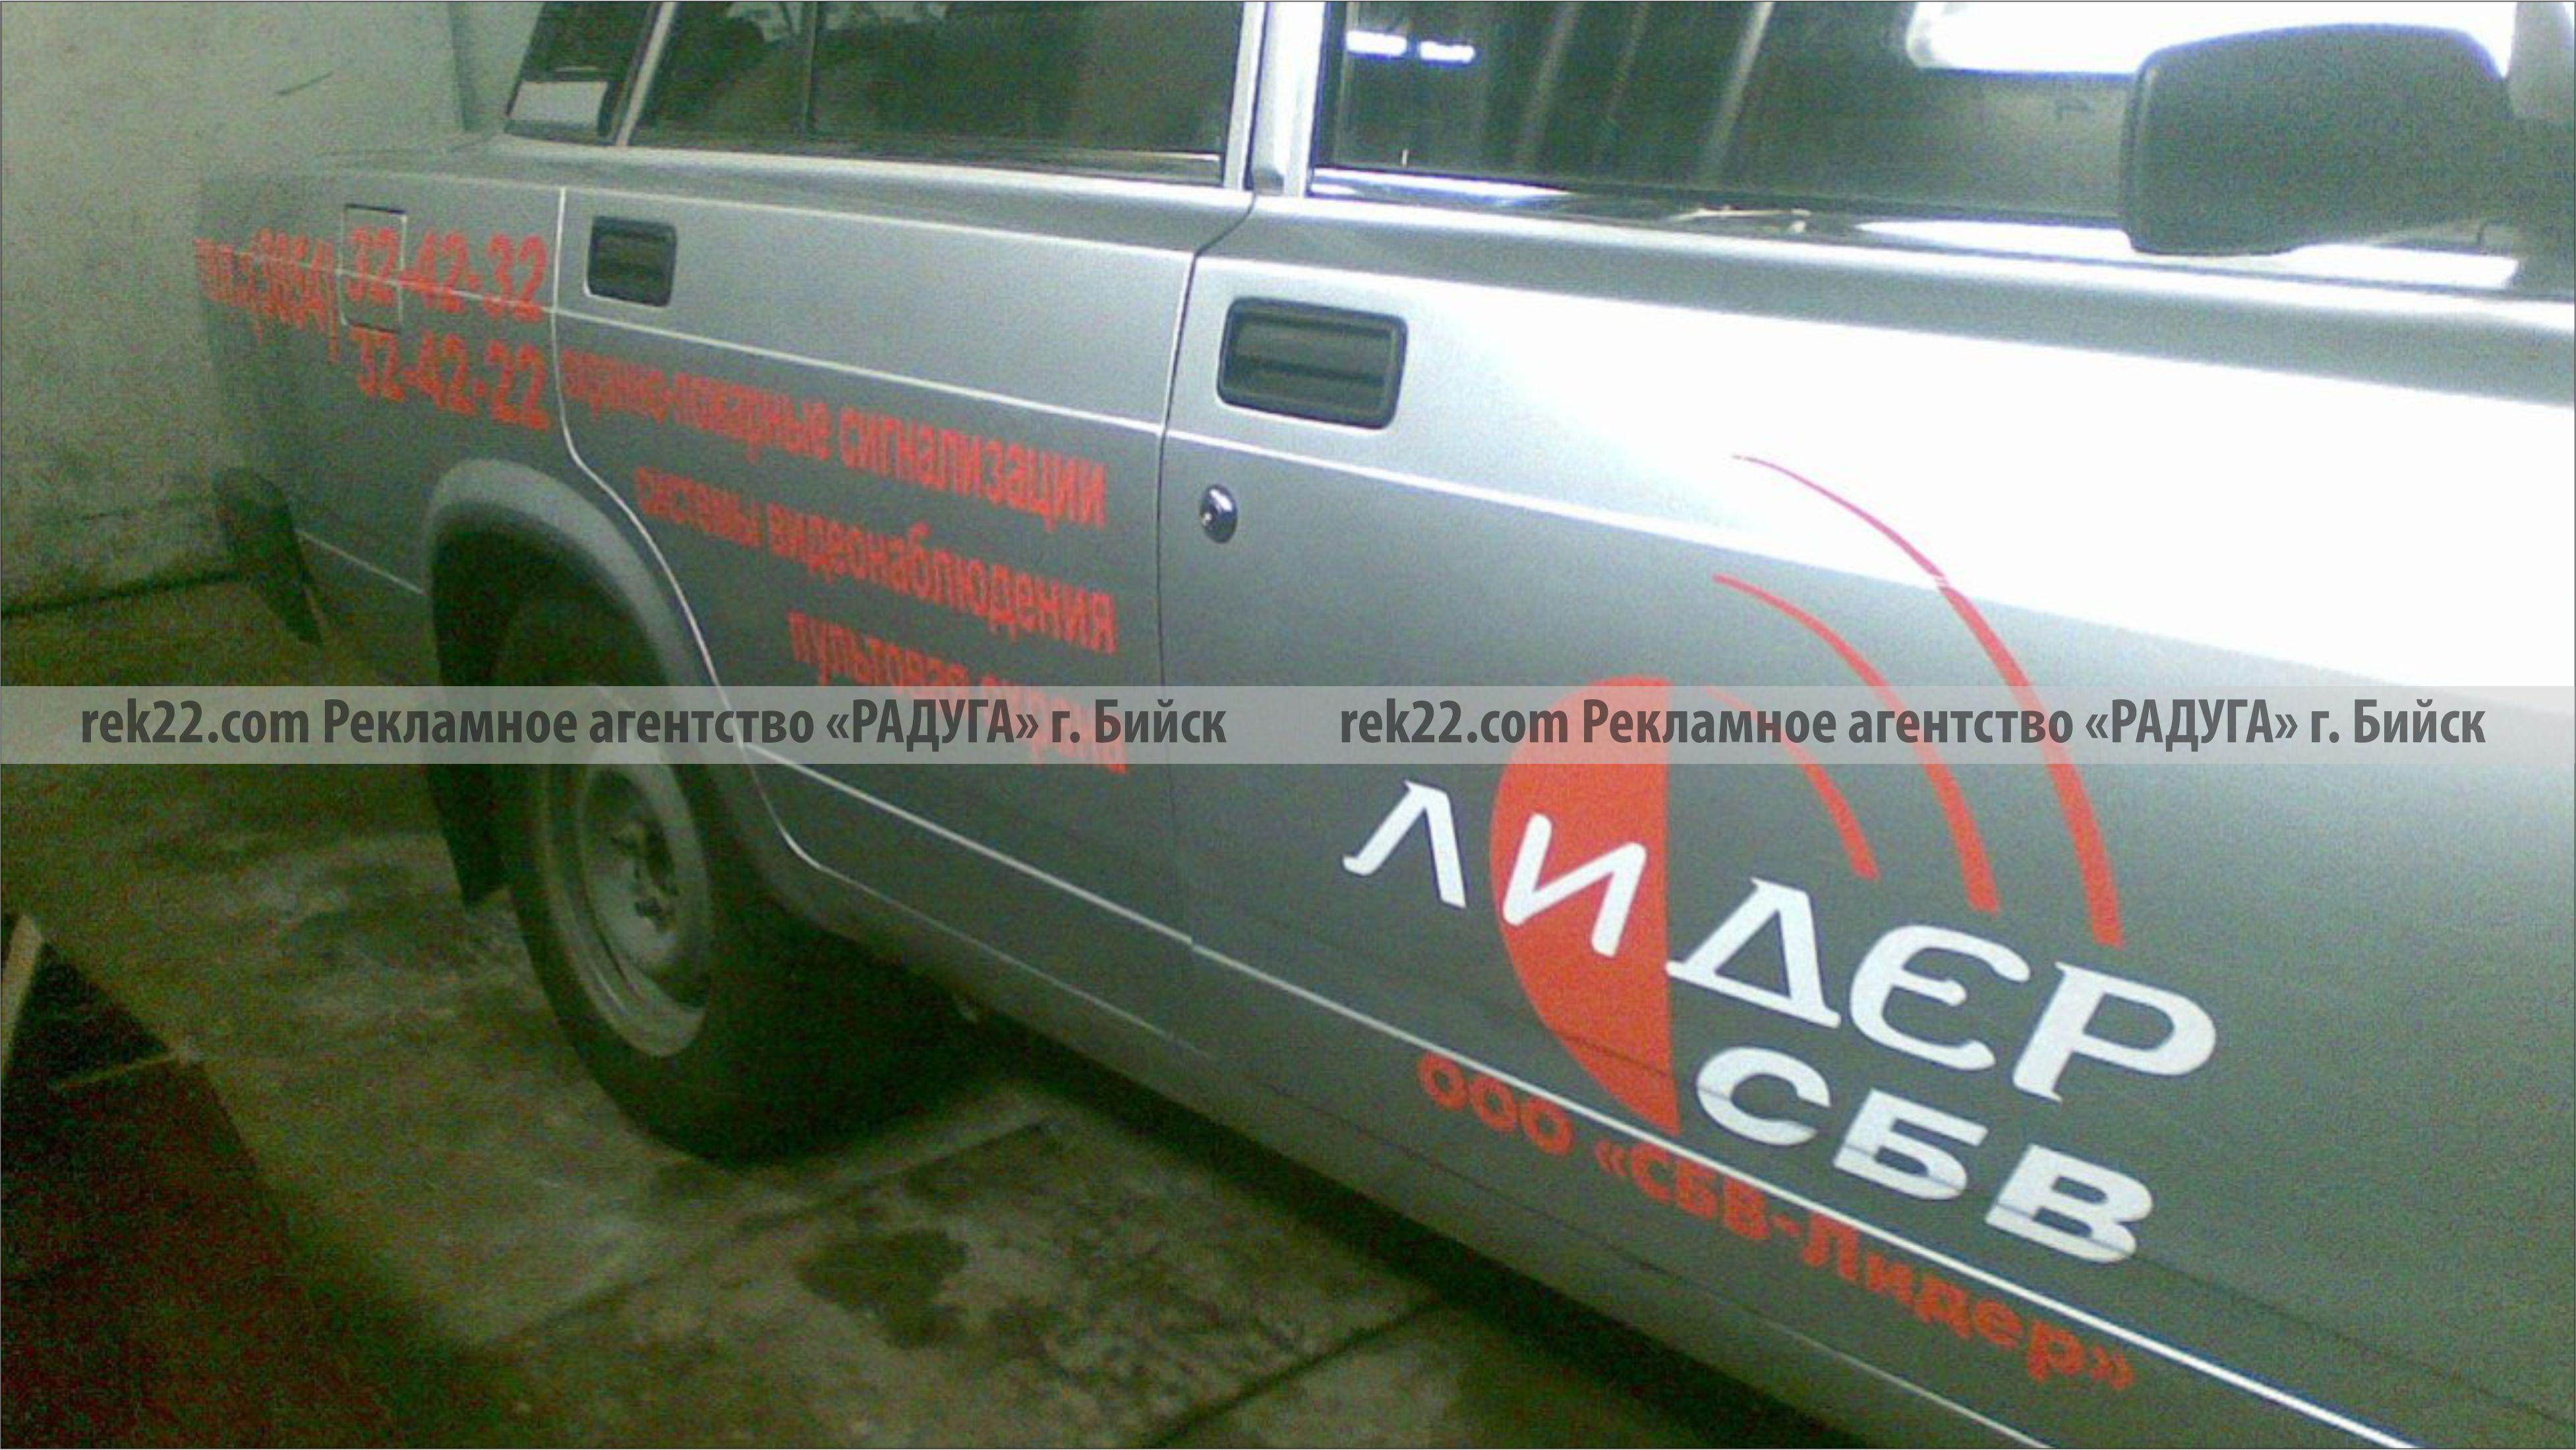 Реклама на транспорте Бийск - оклейка авто - 5.0